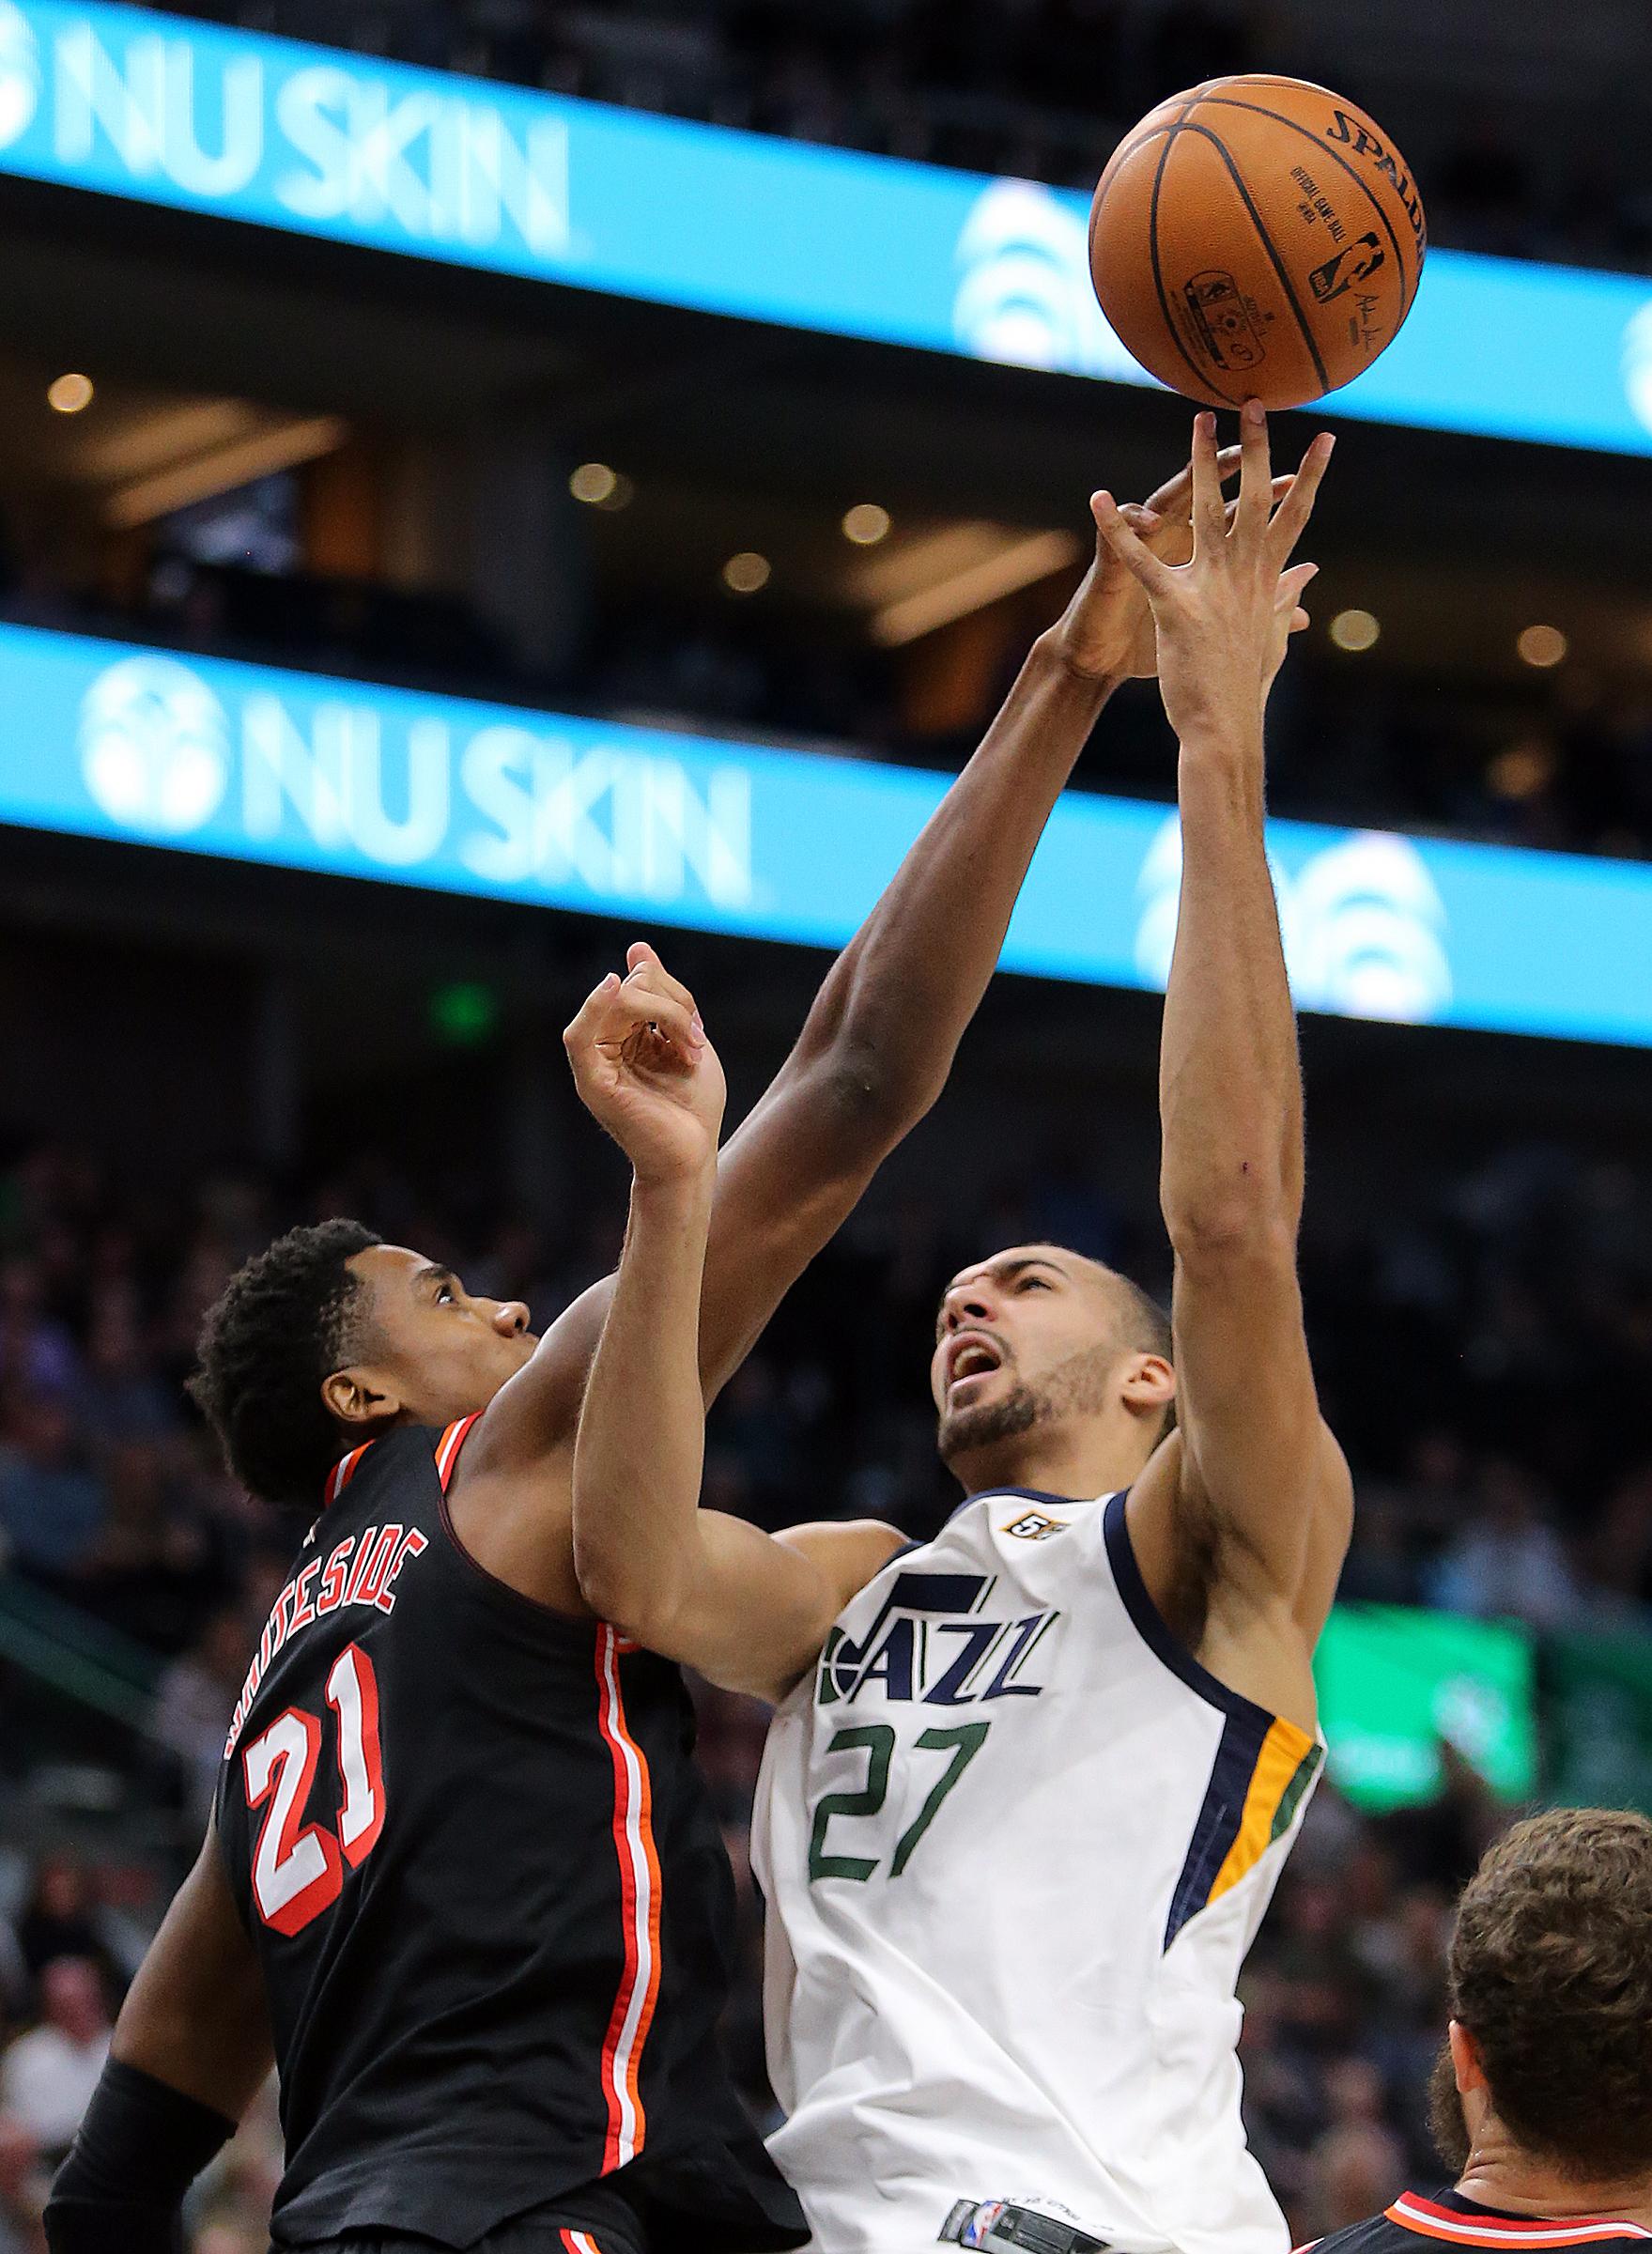 Utah Jazz center Rudy Gobert (27) shoots over Miami Heat center Hassan Whiteside (21).